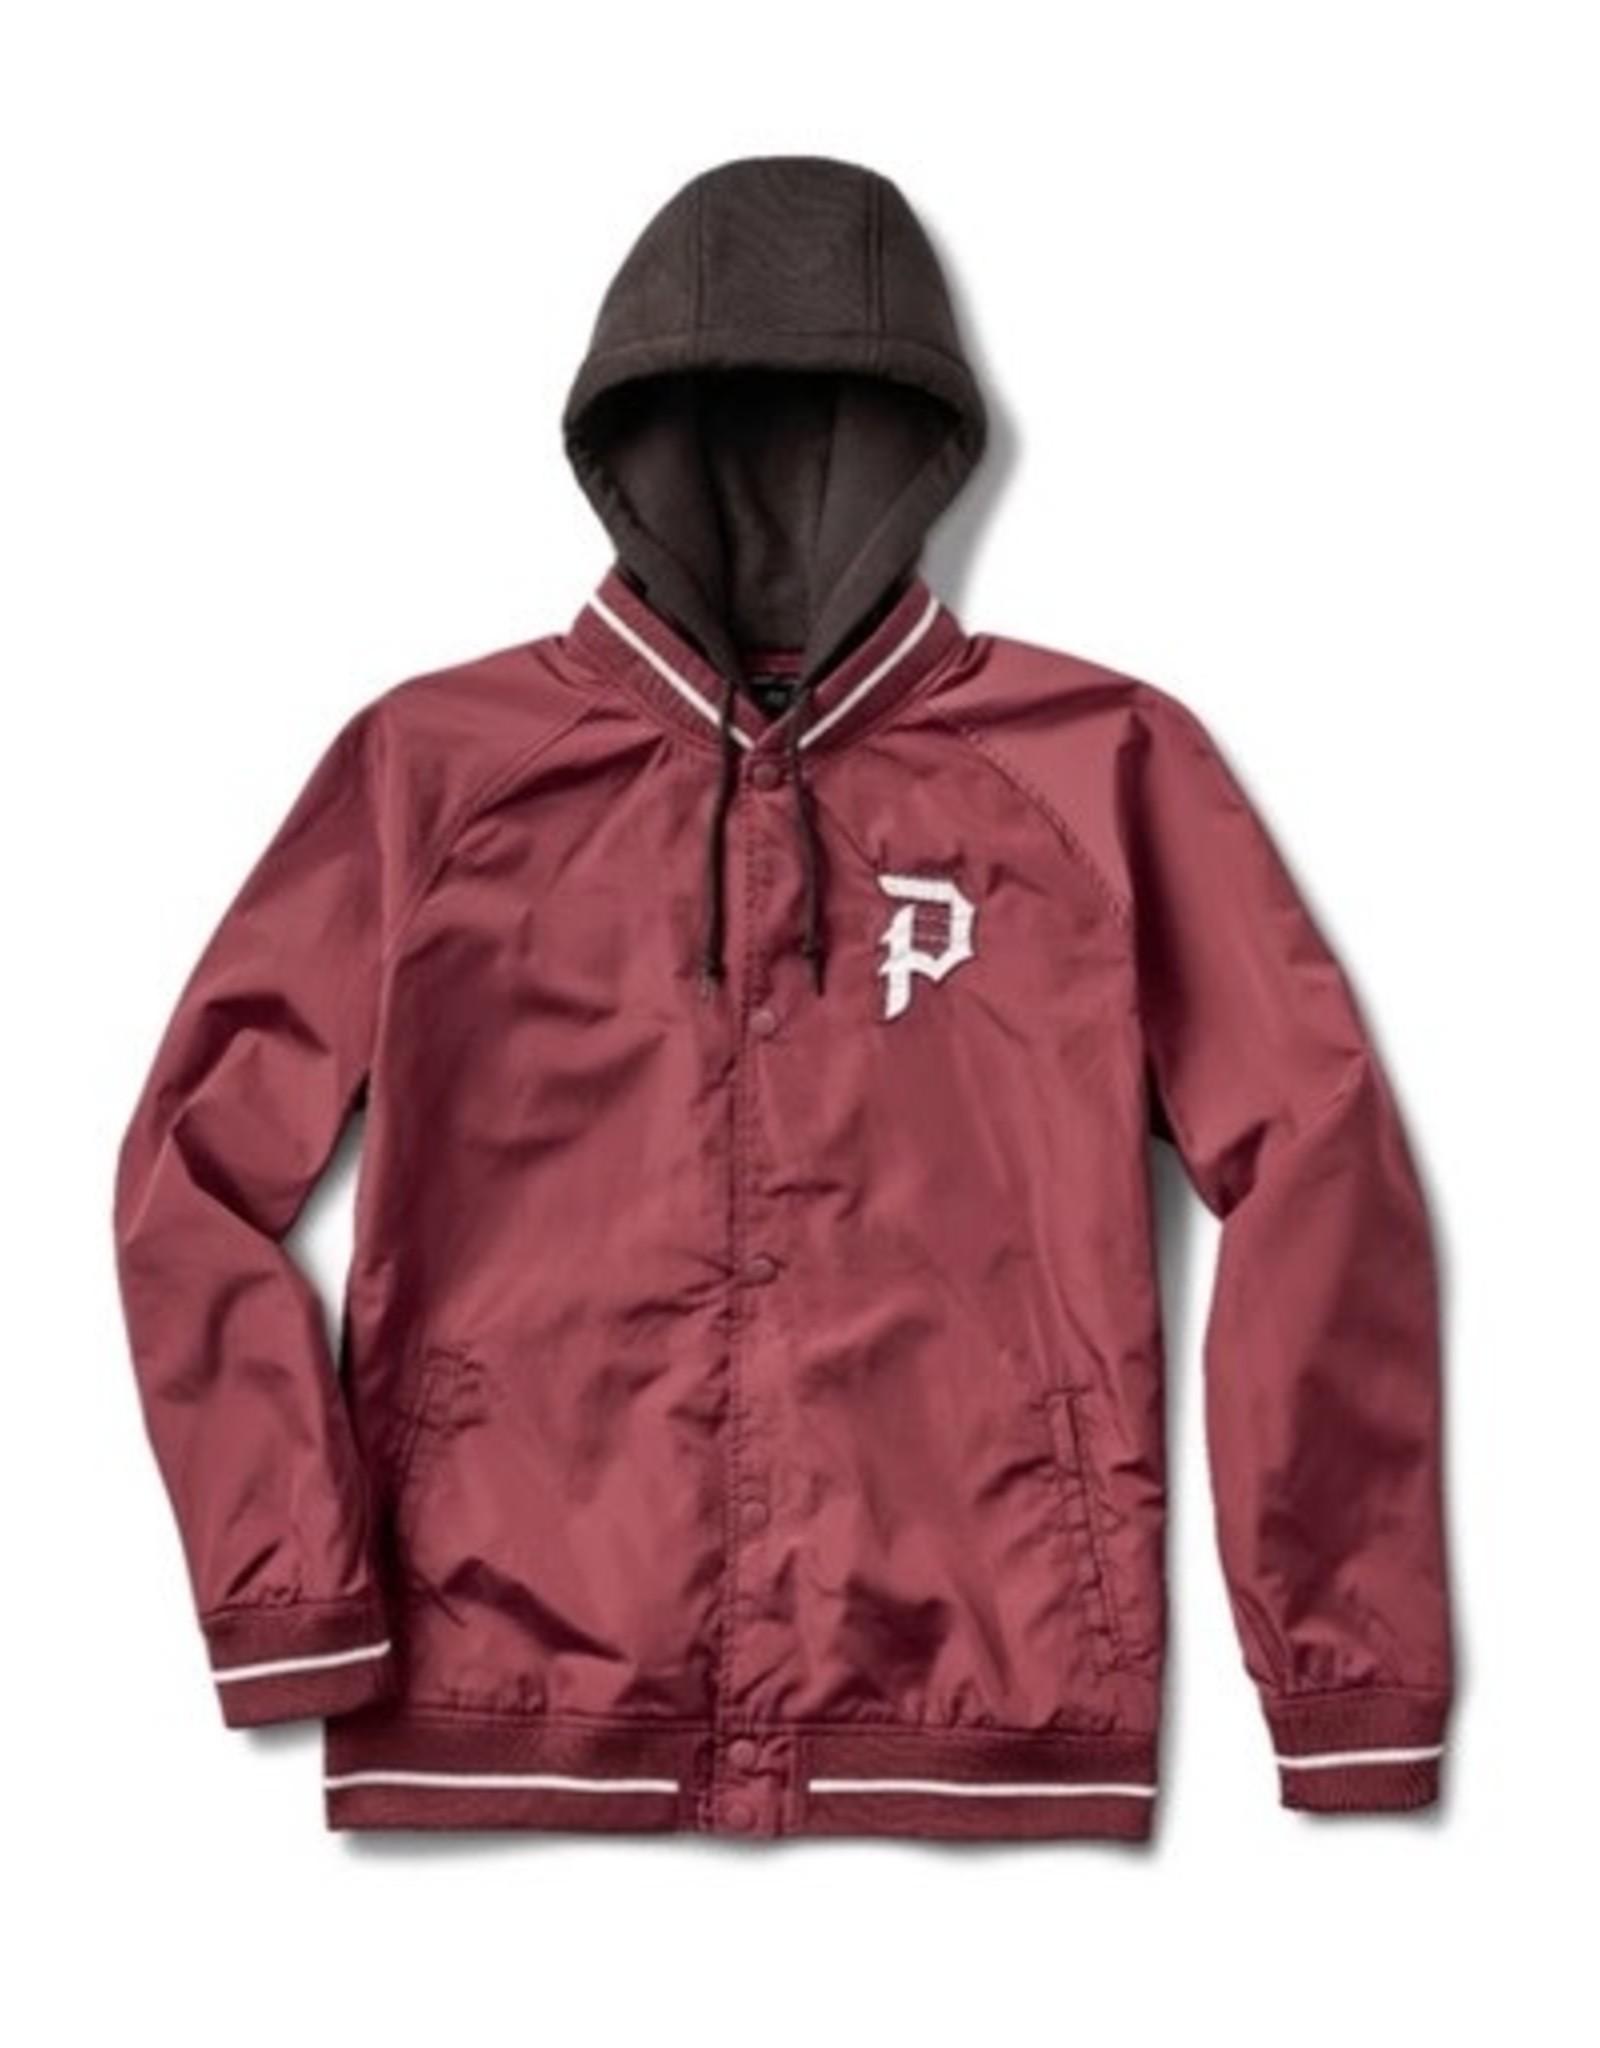 Primitive Two Fer Varsity Jacket